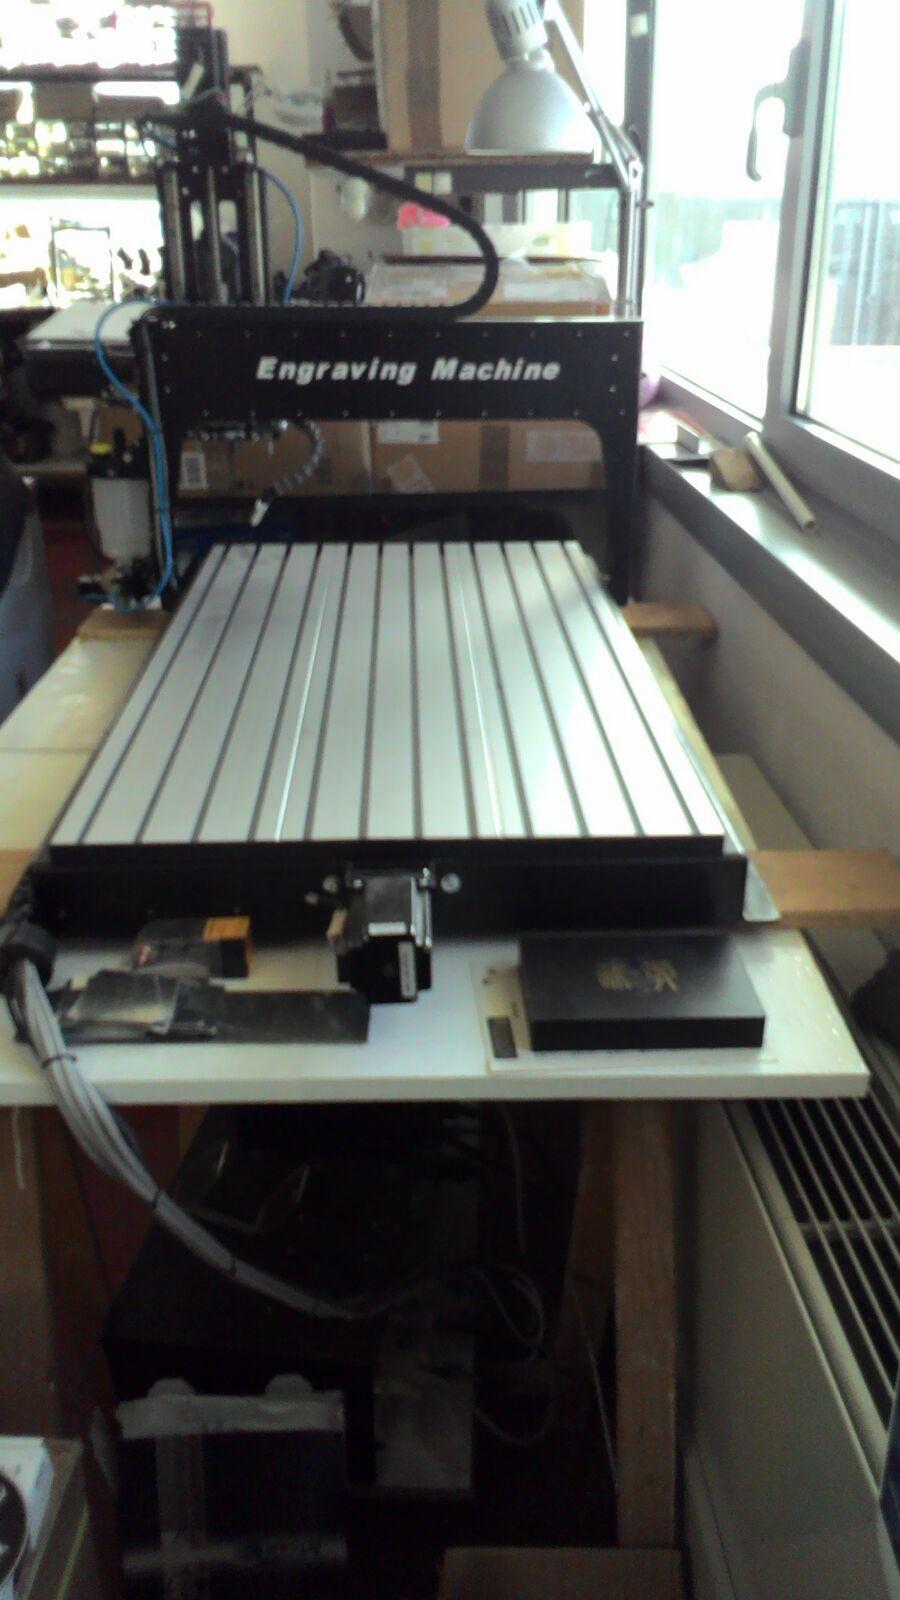 Pantografo Fresatrice Computerizzato RM-EasyStep 3D cnc RM Ronchini Macchinari usati - Exapro